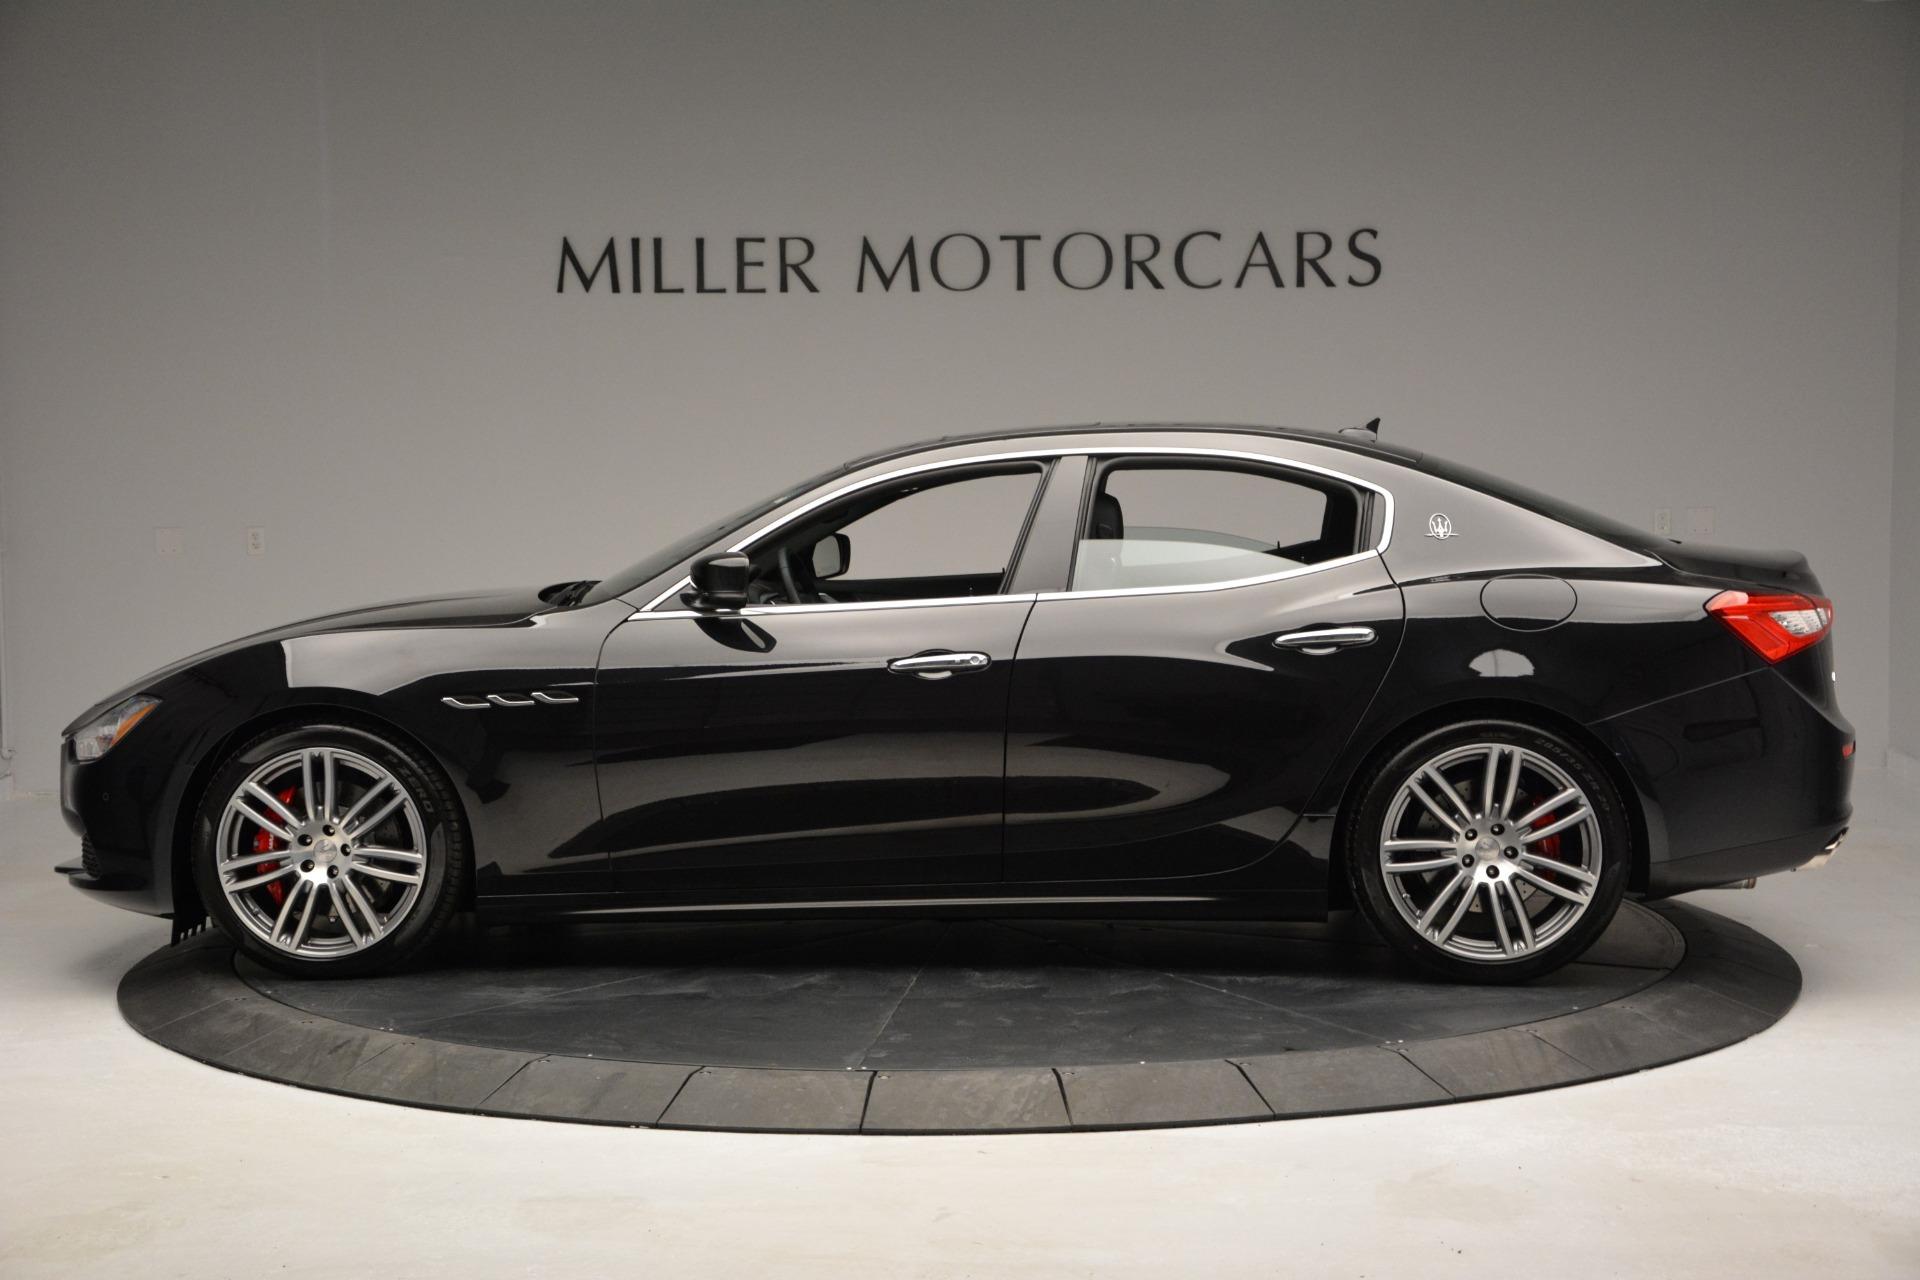 Used 2015 Maserati Ghibli S Q4 For Sale In Westport, CT 2070_p3